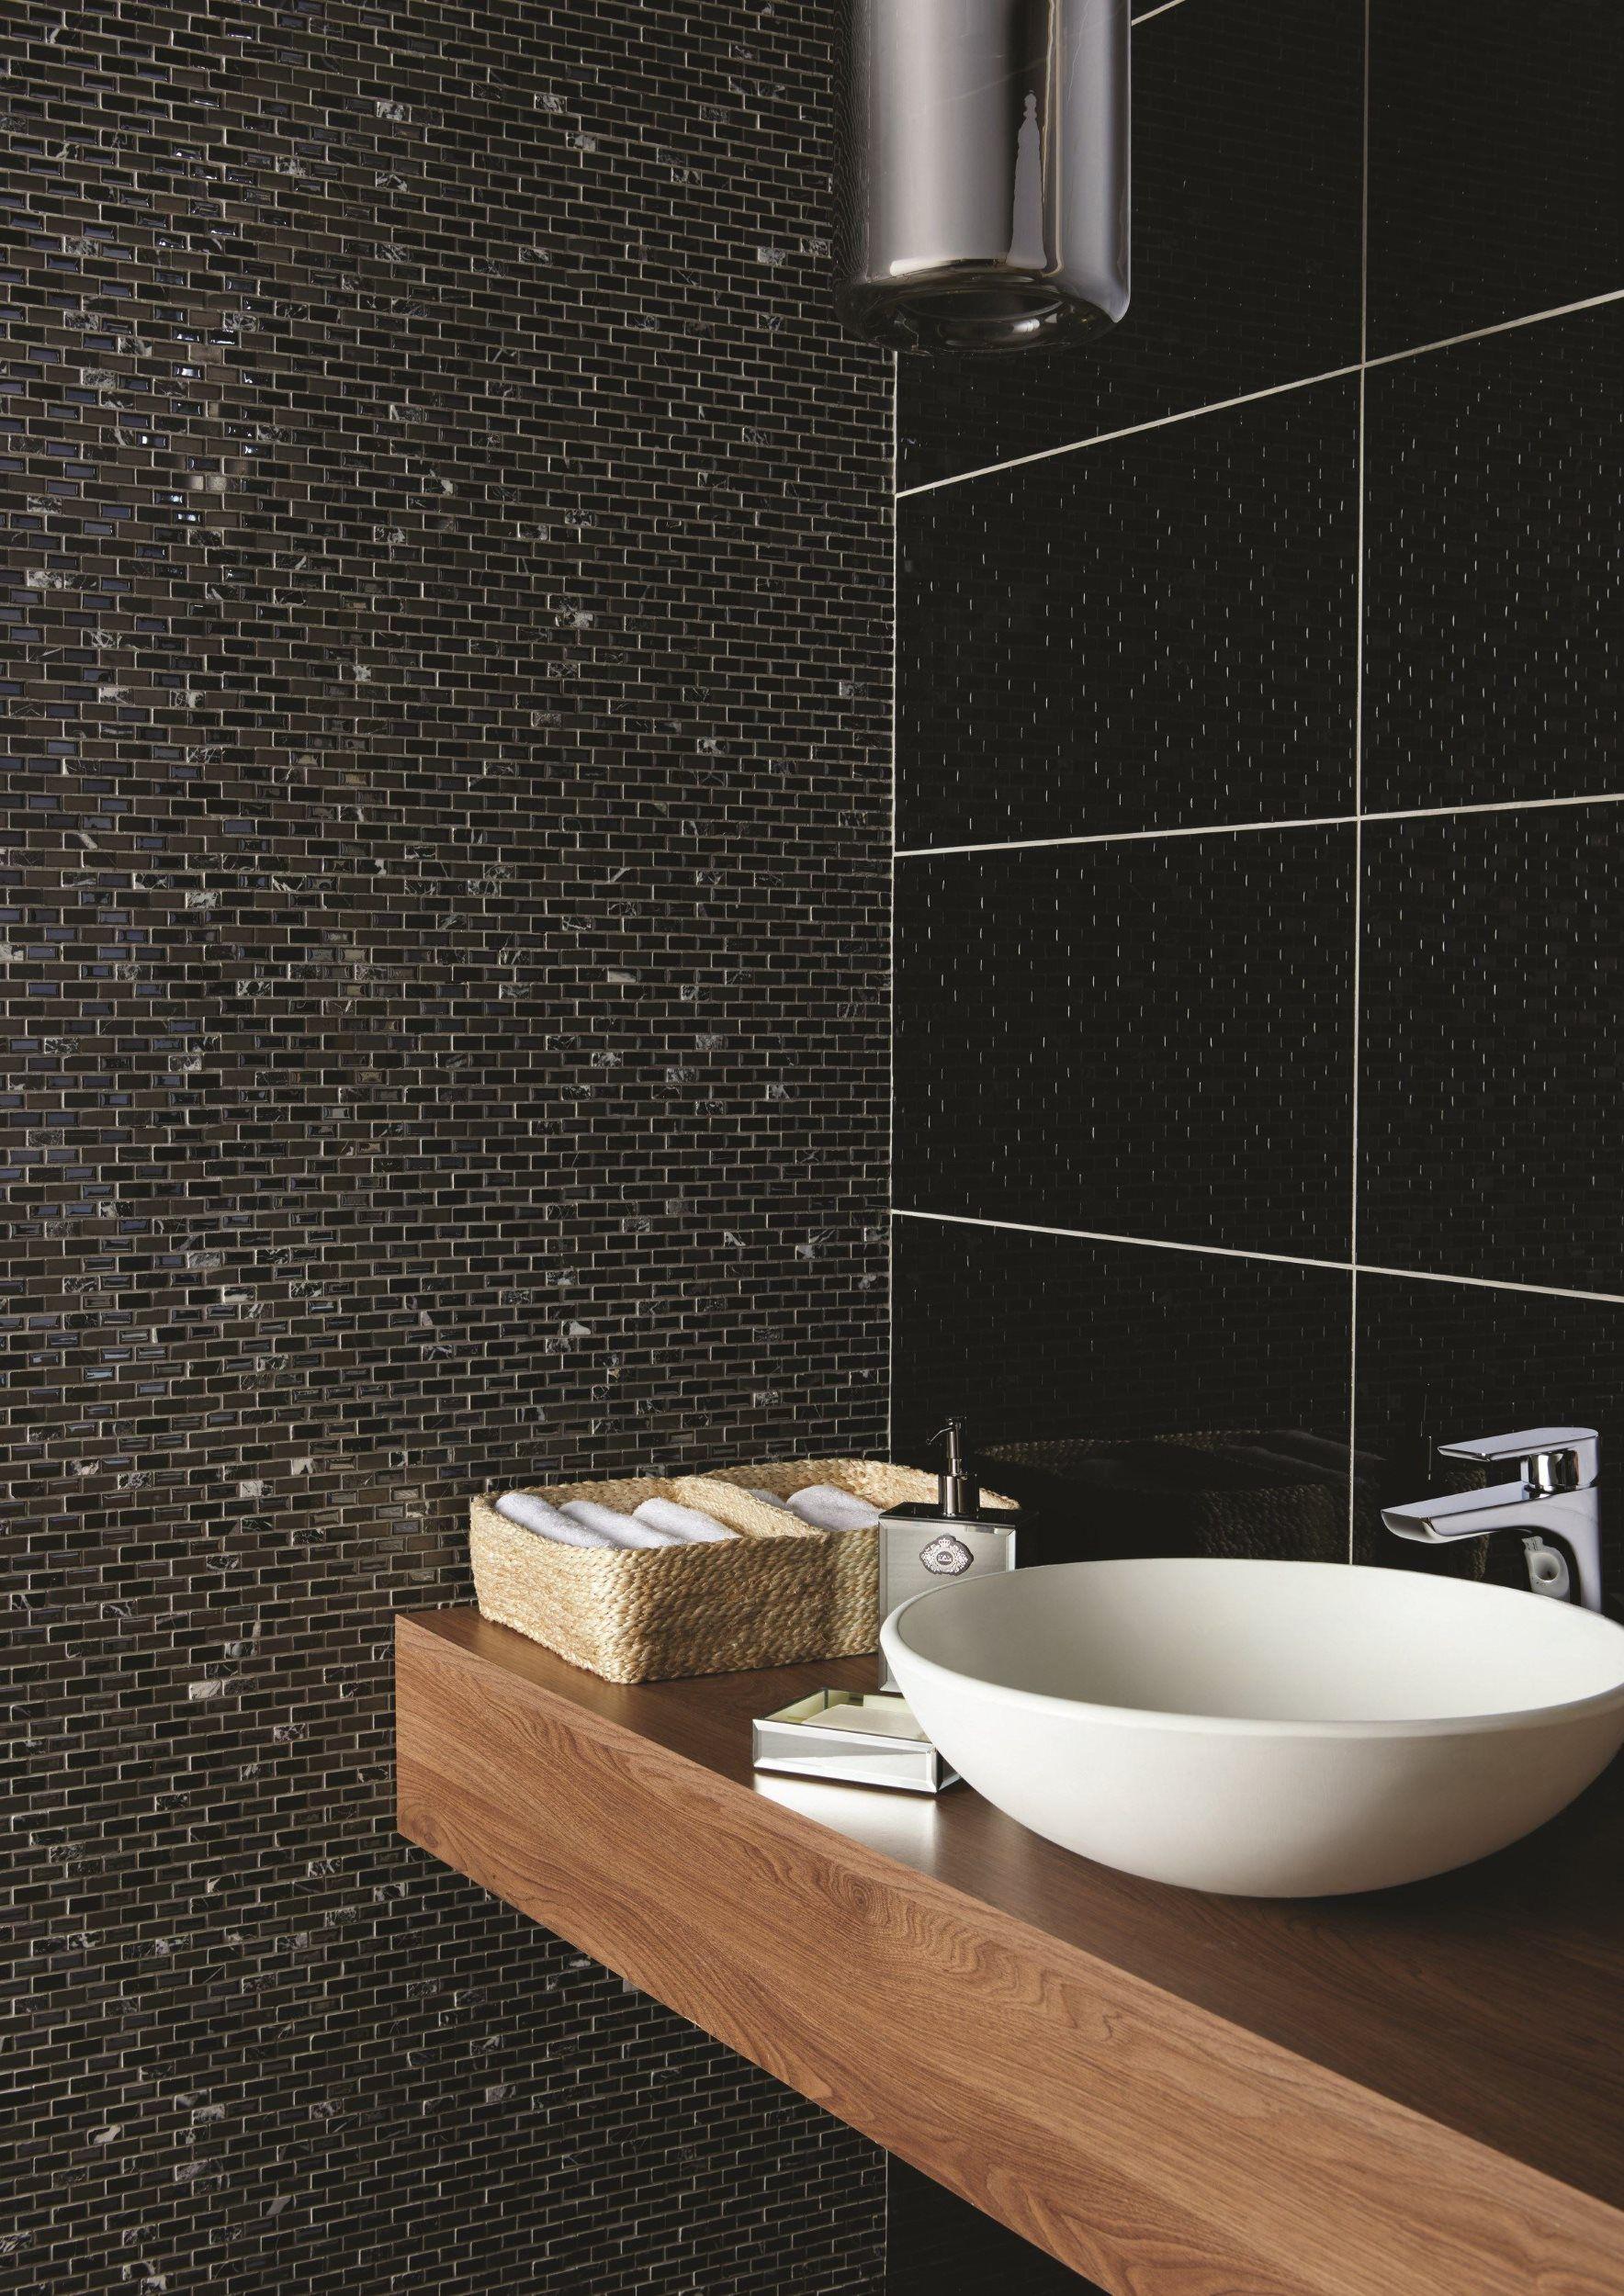 Kauali brickbond mosaics feature a fix of stone, metal and glass ...